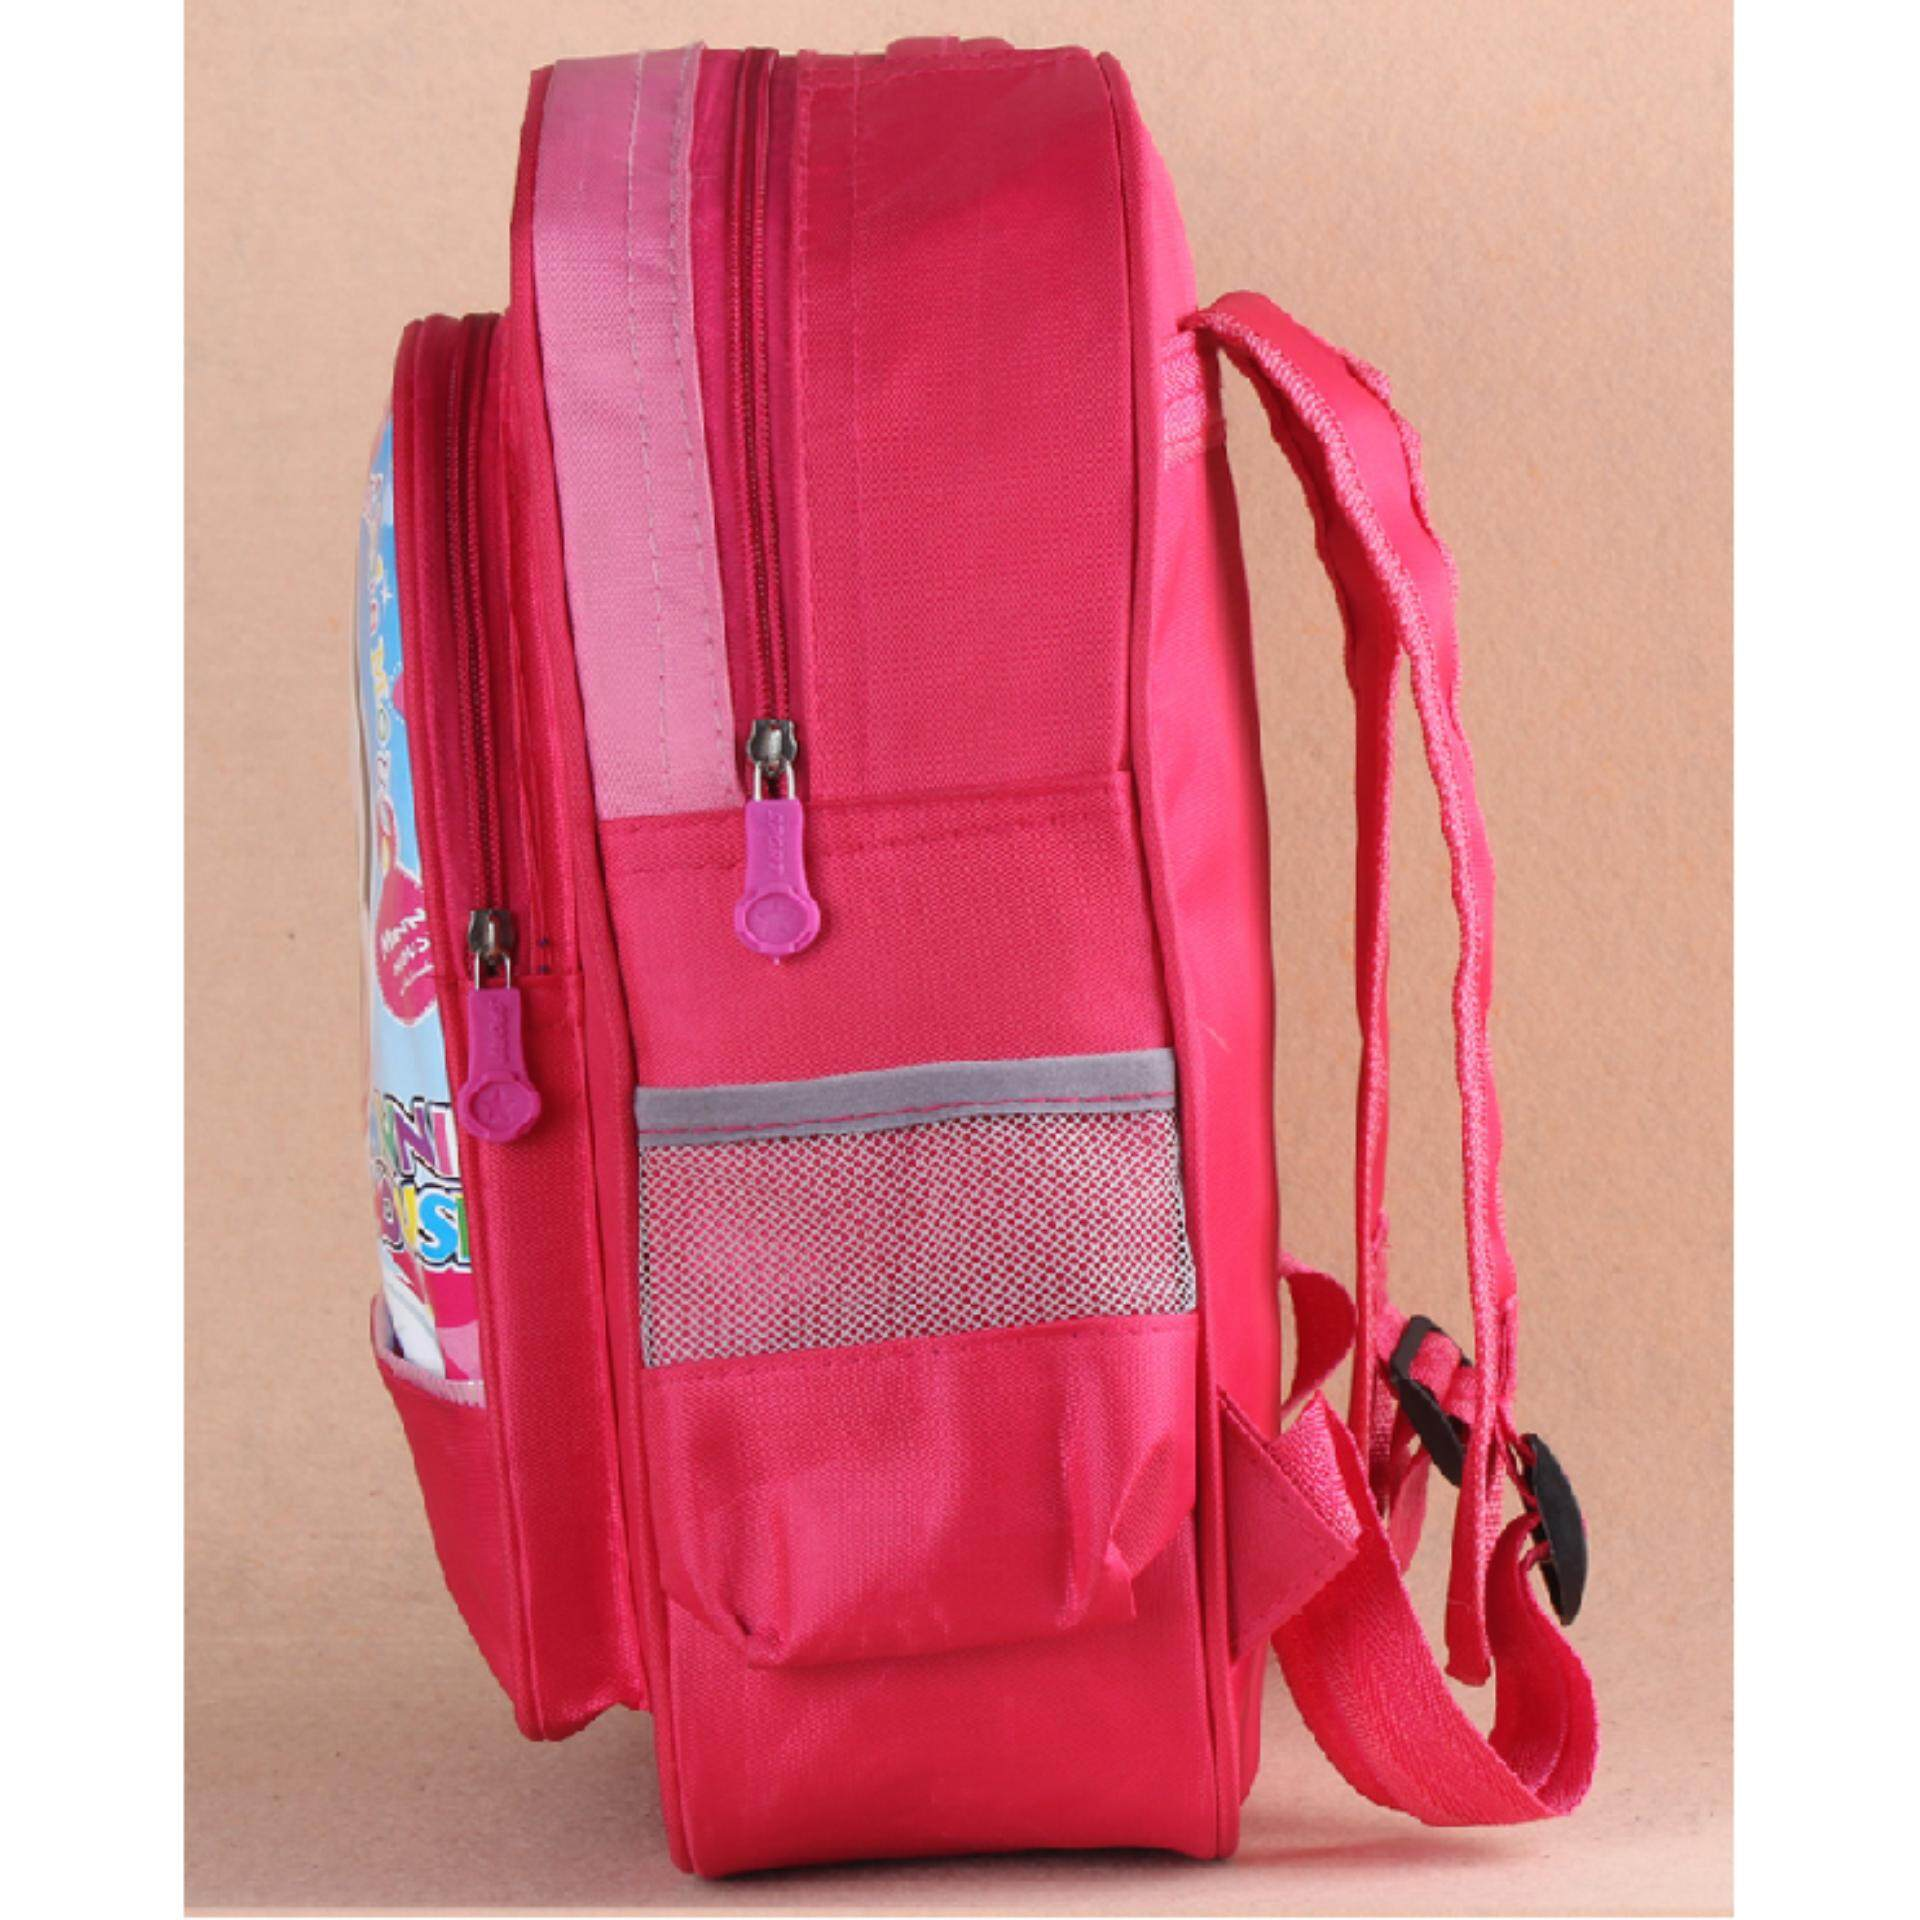 Red Kids Preschool Bag MYESKB042